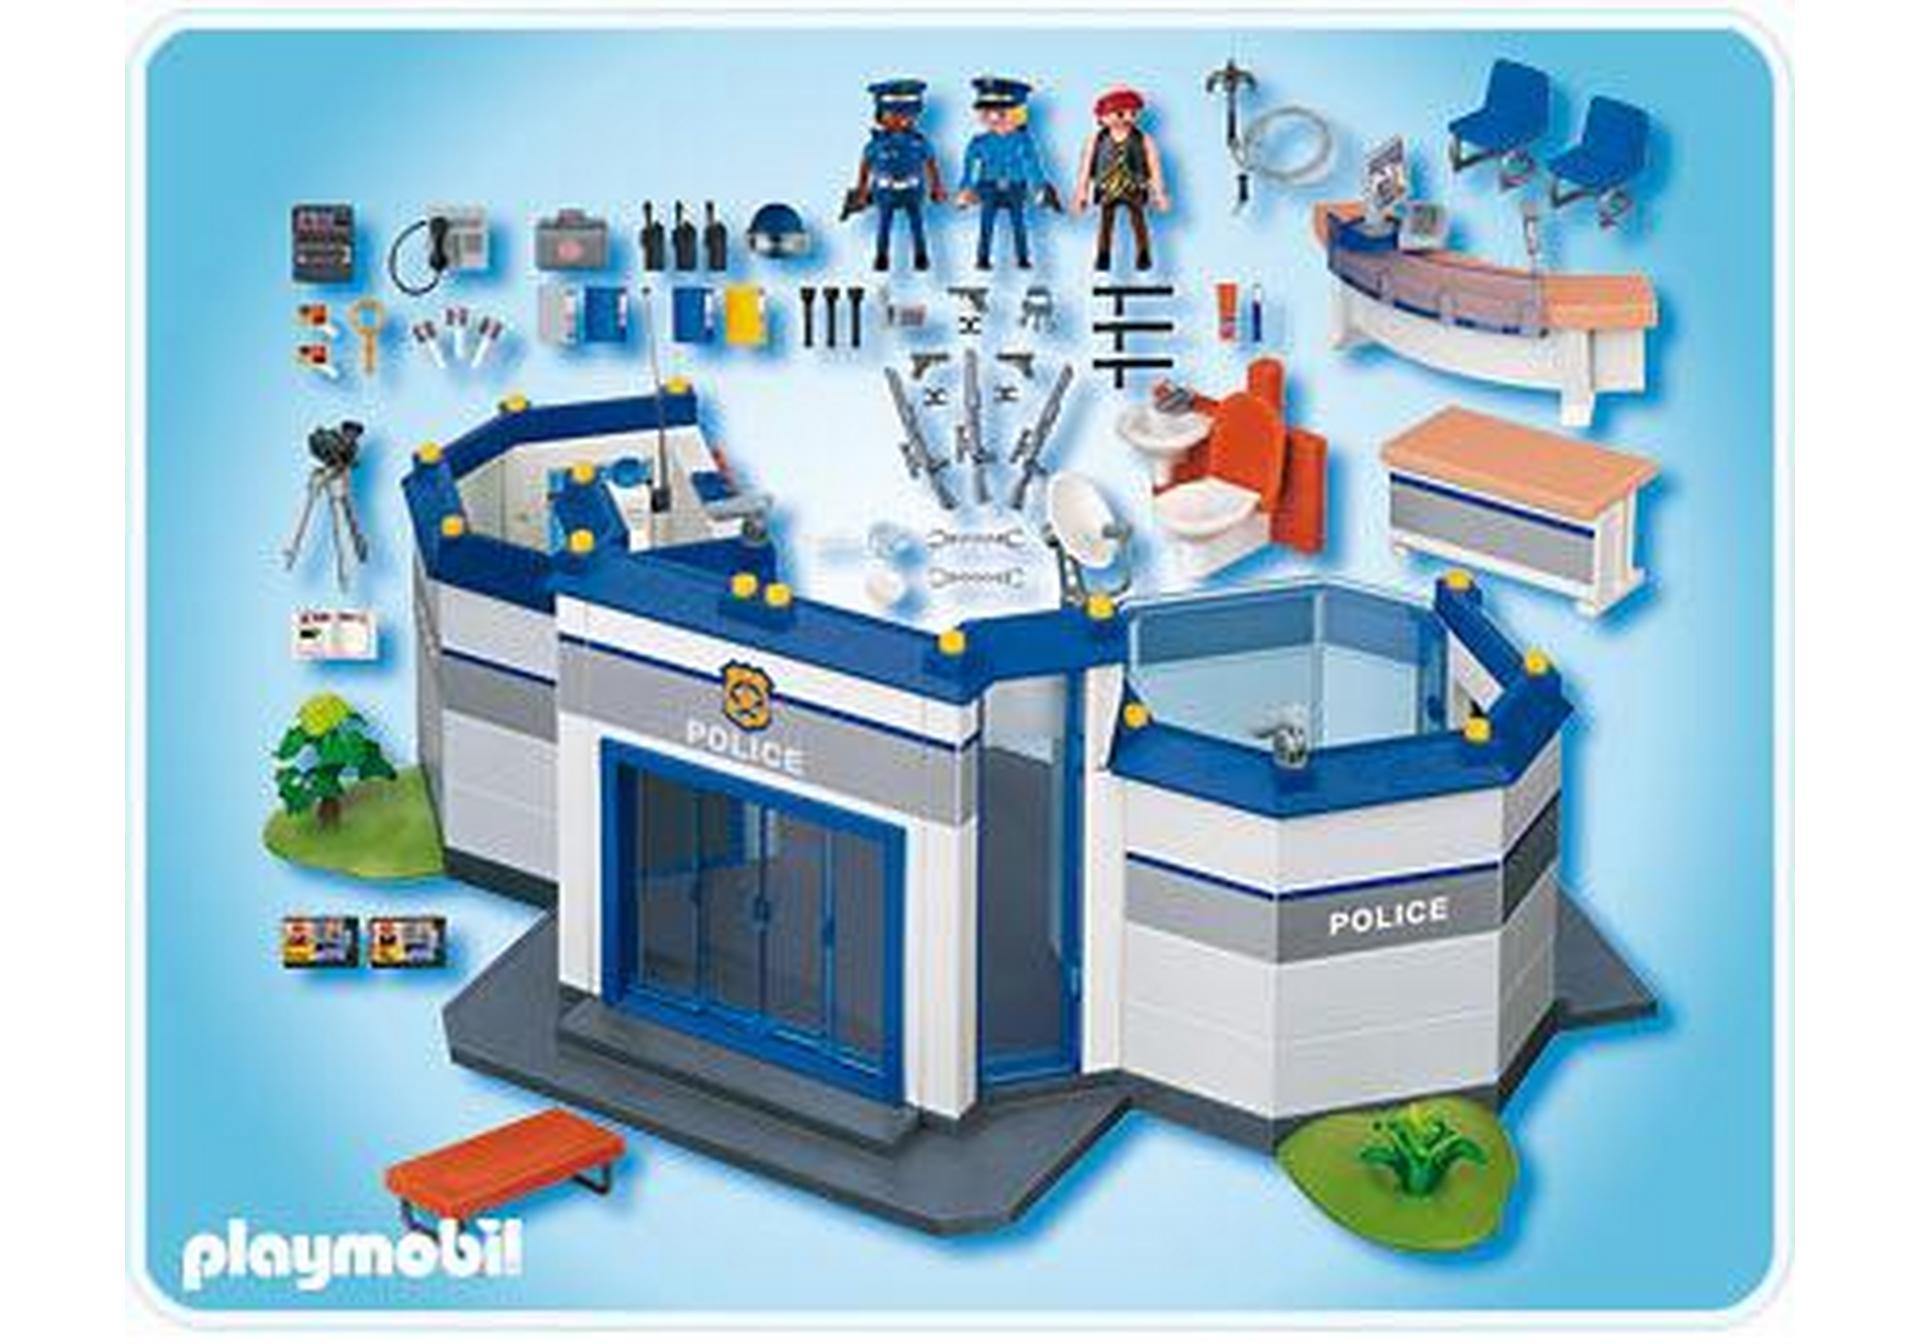 Commissariat de police 4264 a playmobil france - Caserne de police playmobil ...